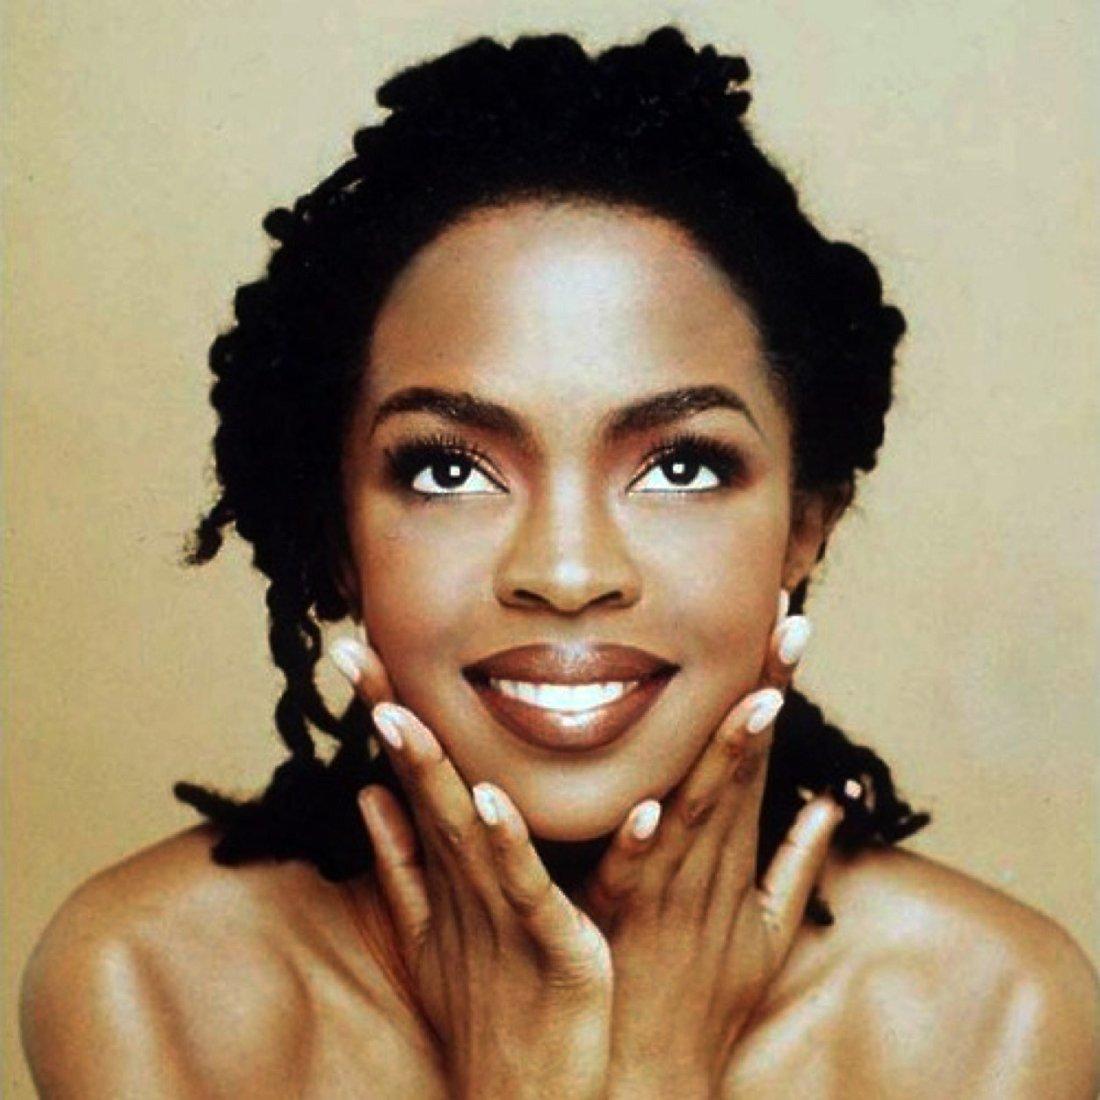 African American News, African American Music, Rhythm & Blues, R&B, The Miseducation of Lauryn Hill, Lauryn Hill, The Fuguees, KOLUMN Magazine, KOLUMN, KINDR'D Magazine, KINDR'D